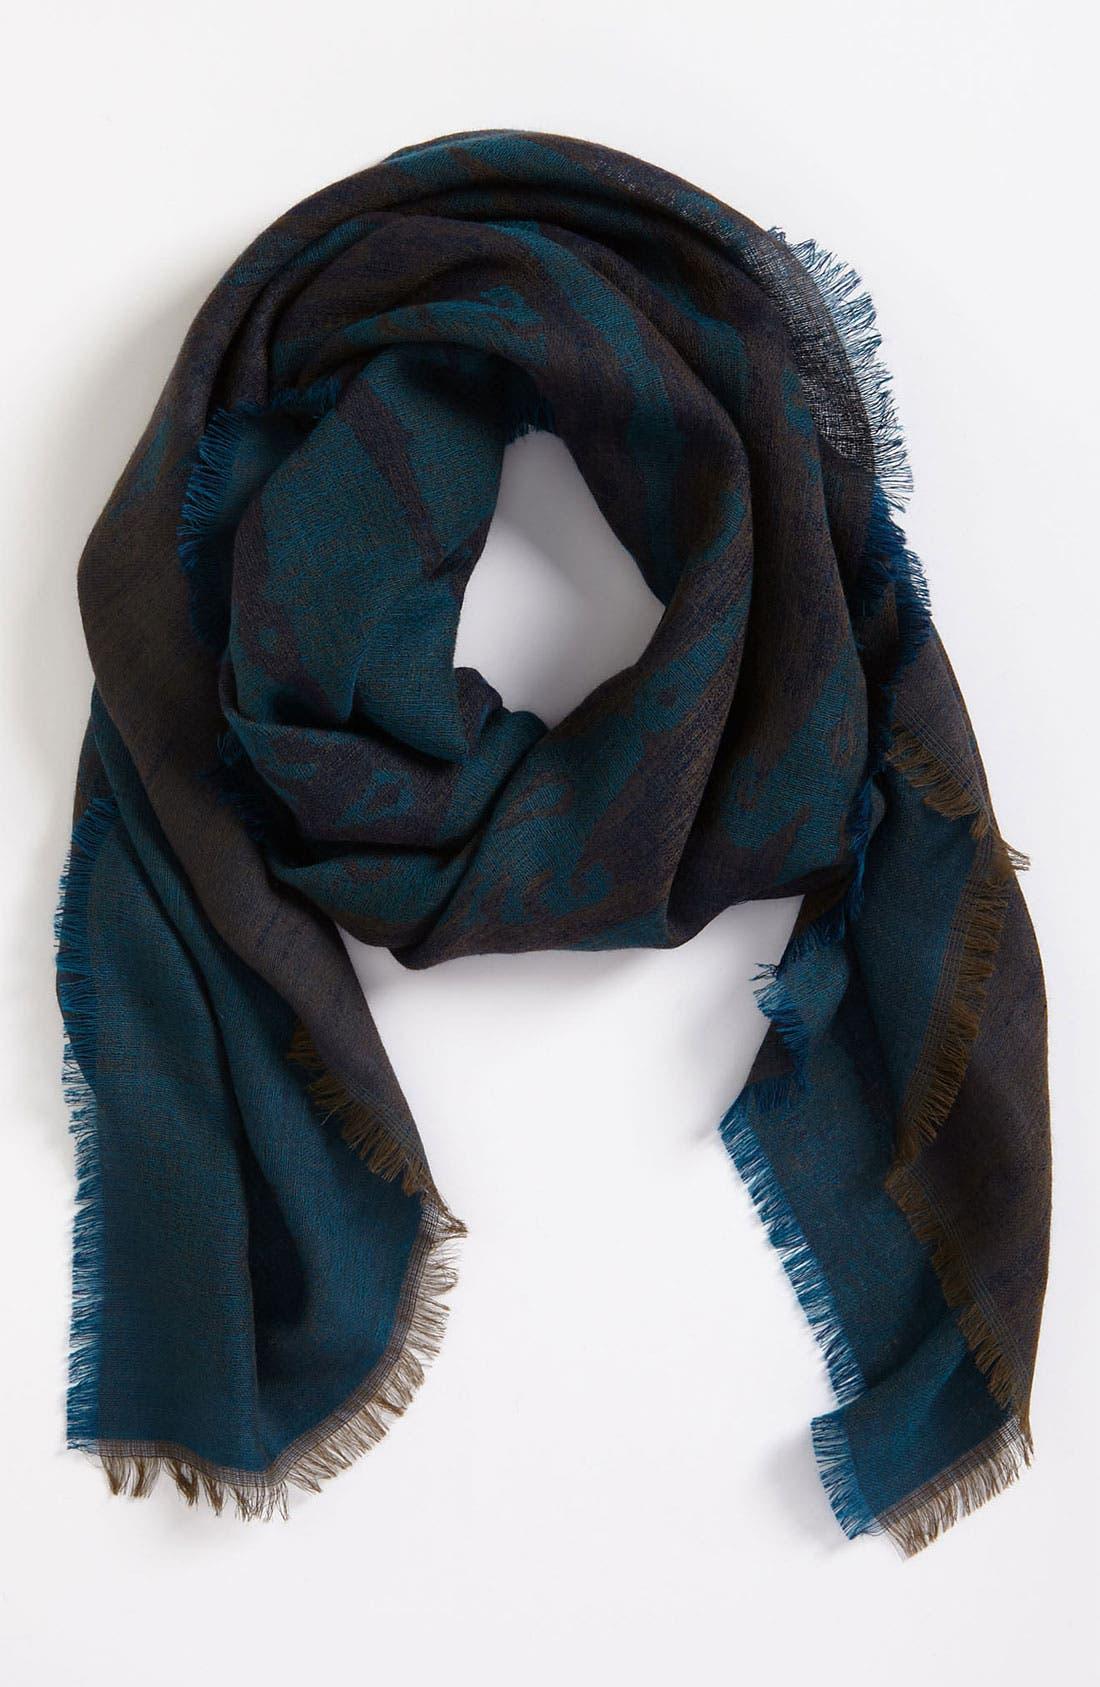 Main Image - Etro Jacquard Wool Scarf